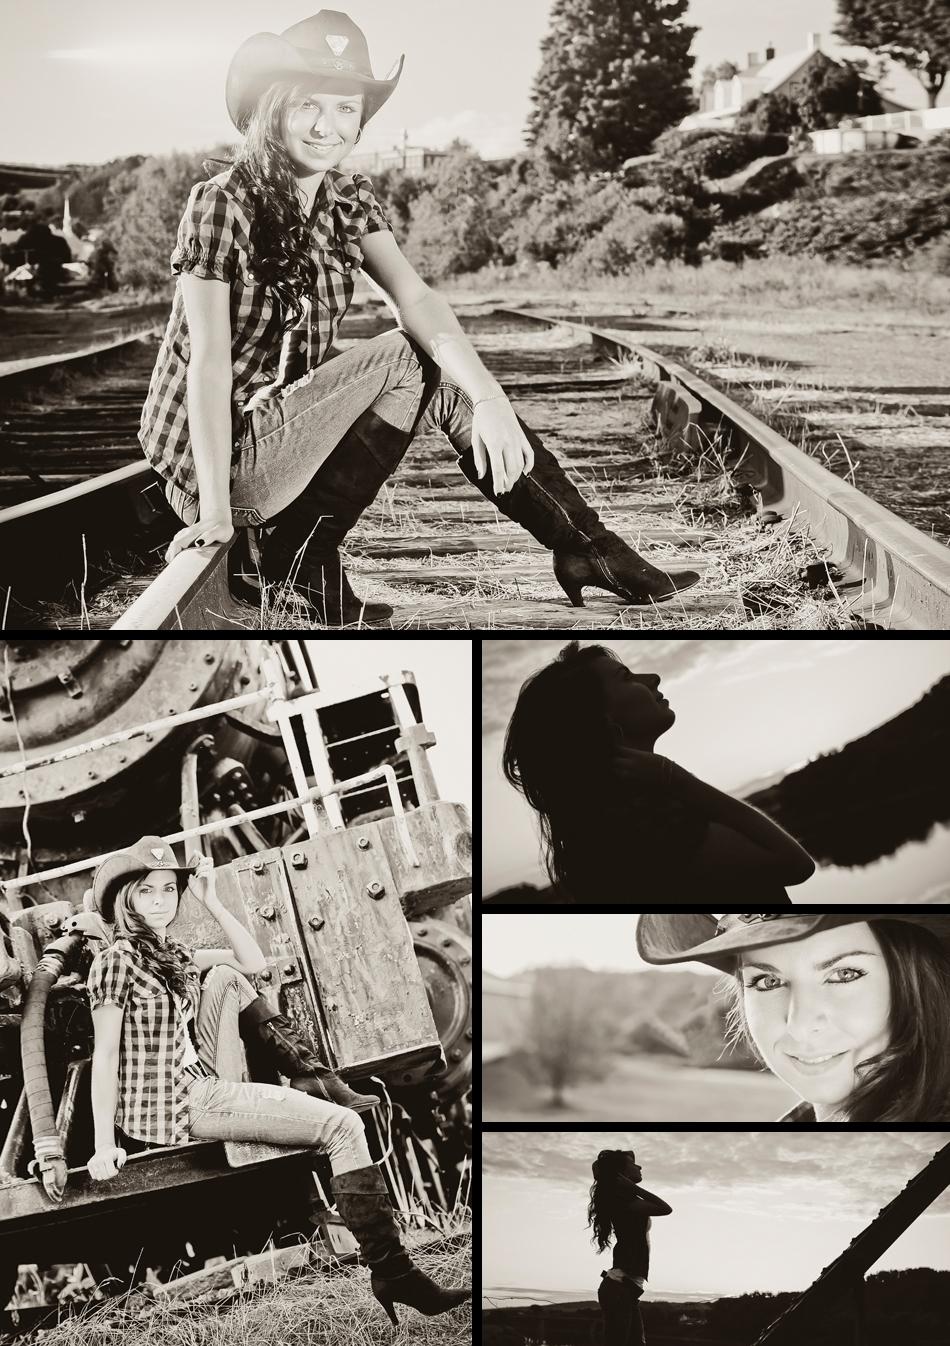 julie_beaulieu_photographe_montage_cowbow_1